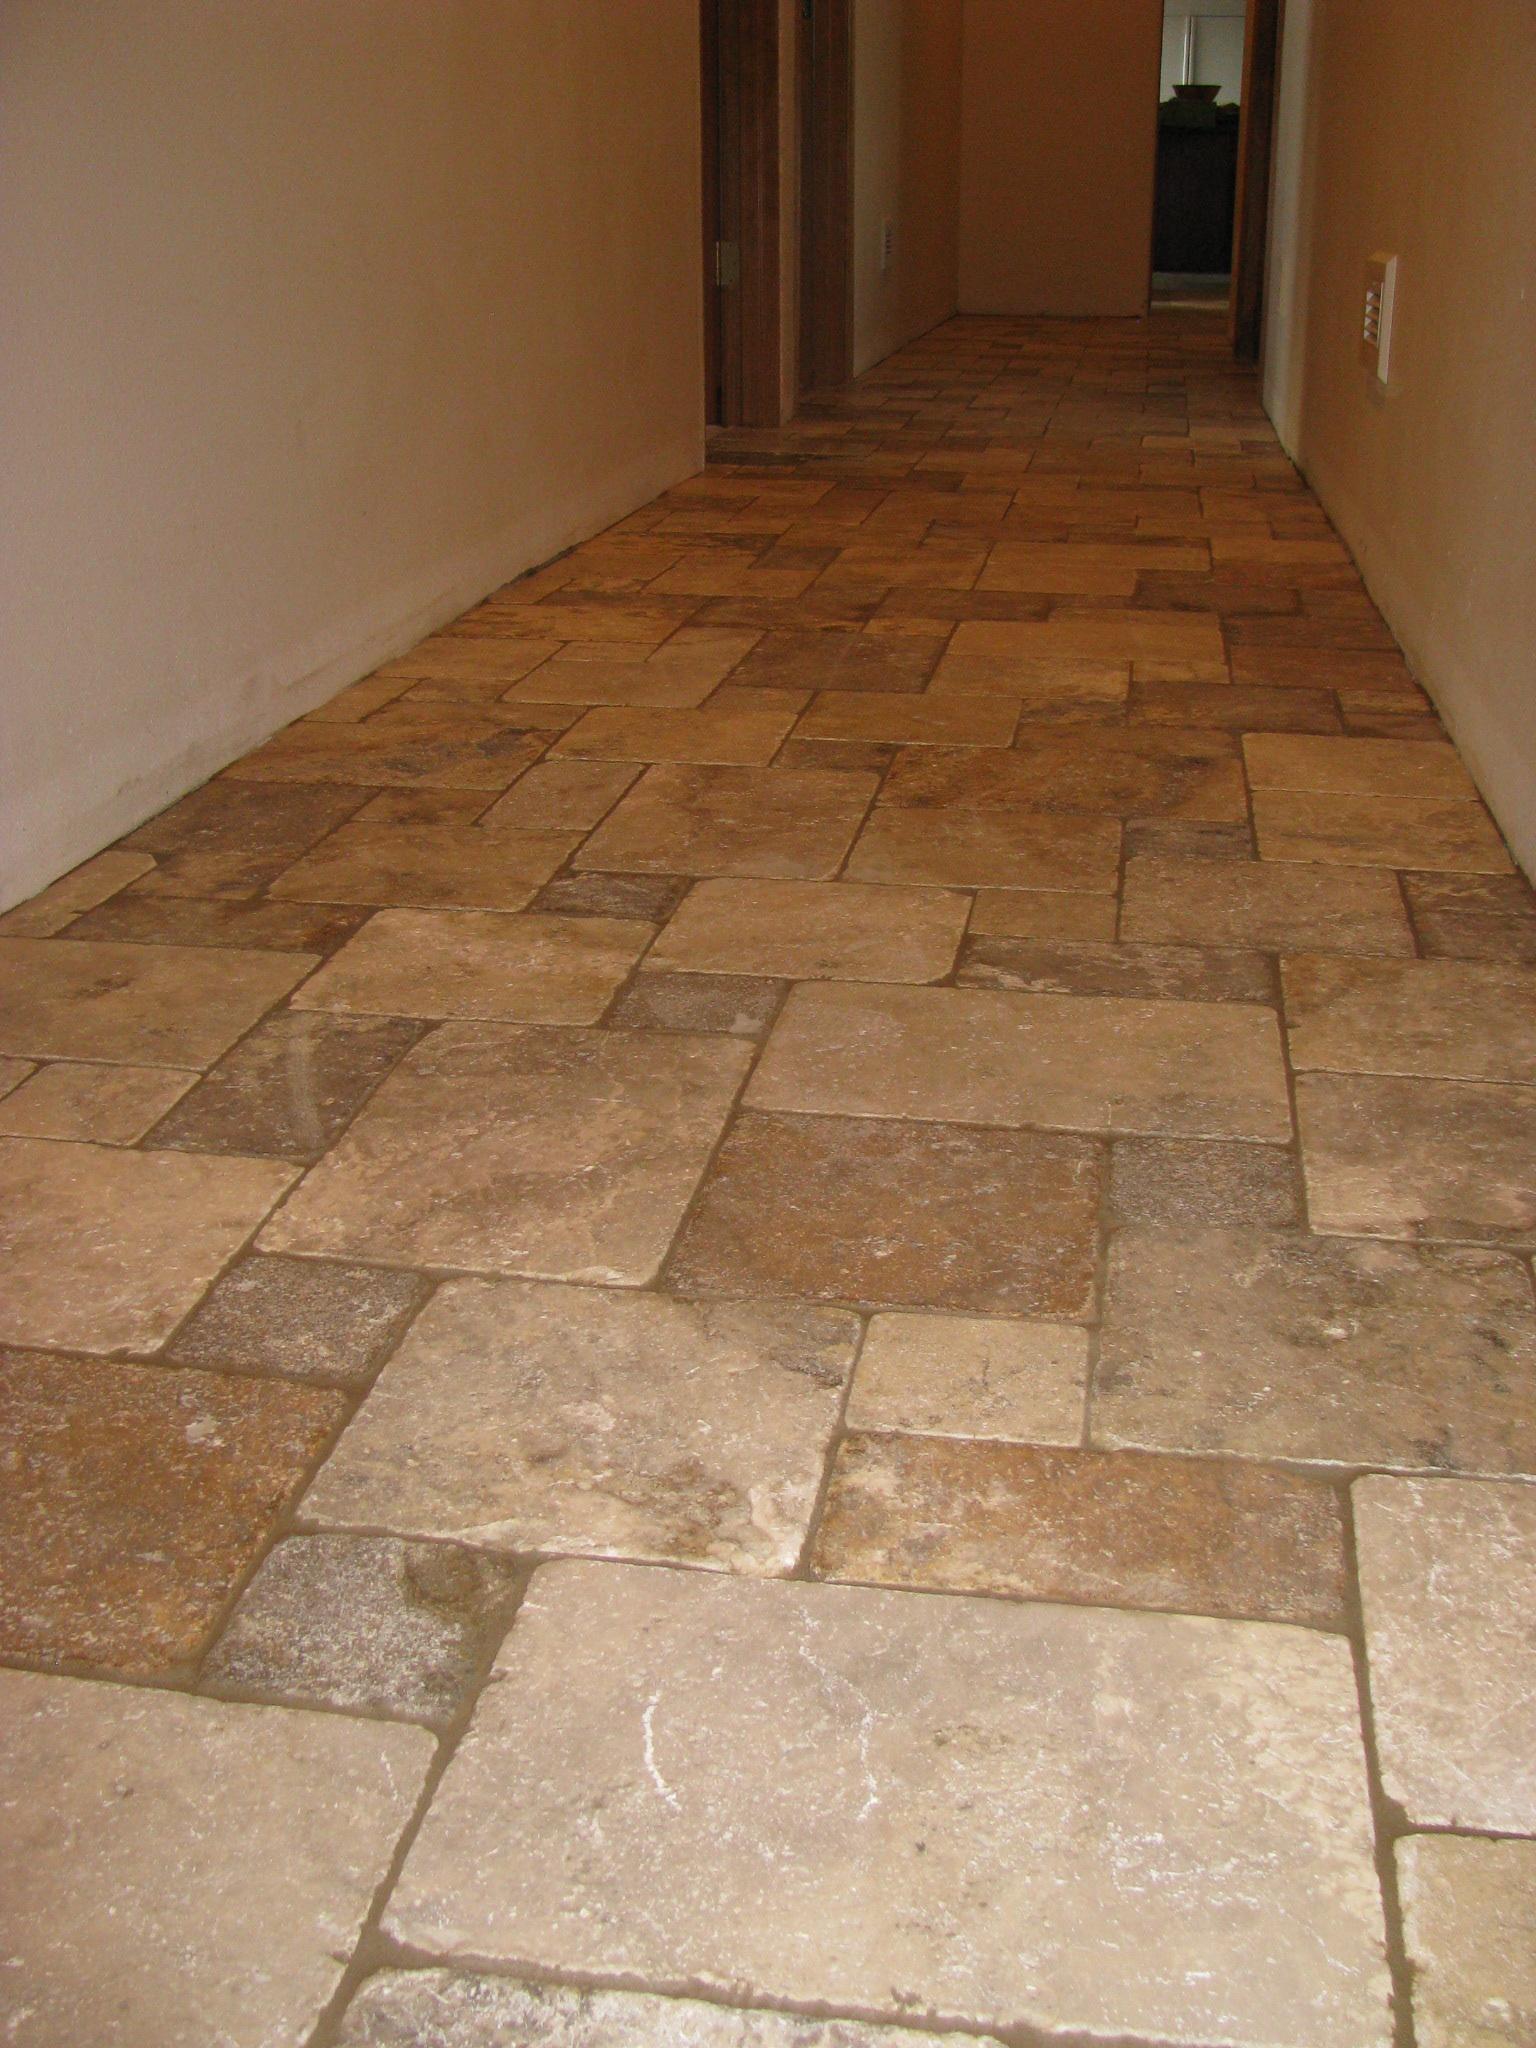 Travertine Tile Flooring by Factor SurfacesTile, Stone & Hardwood ...